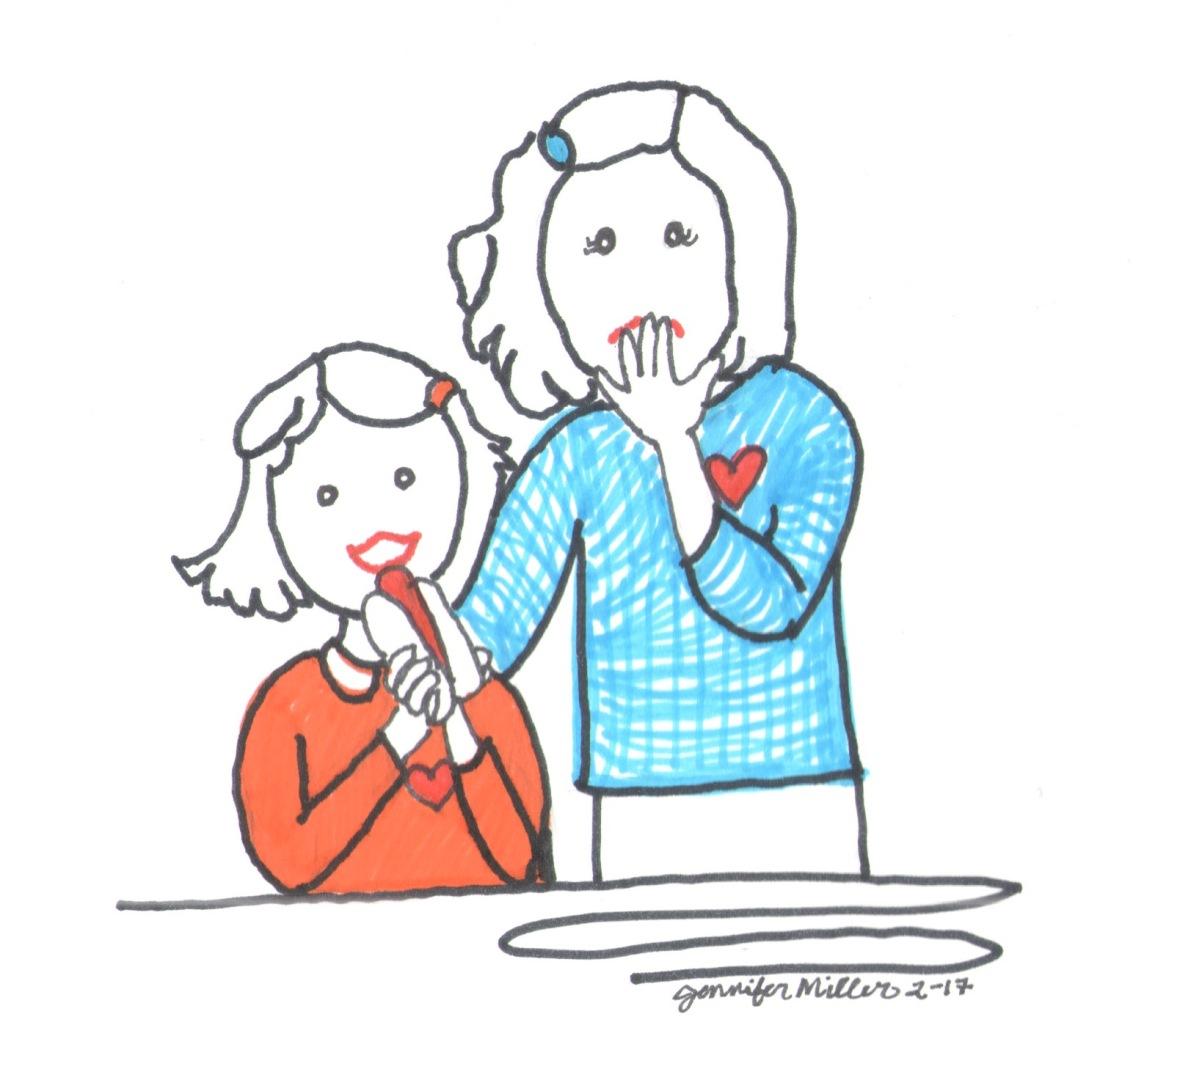 parent-anxiety-by-jennifer-miller